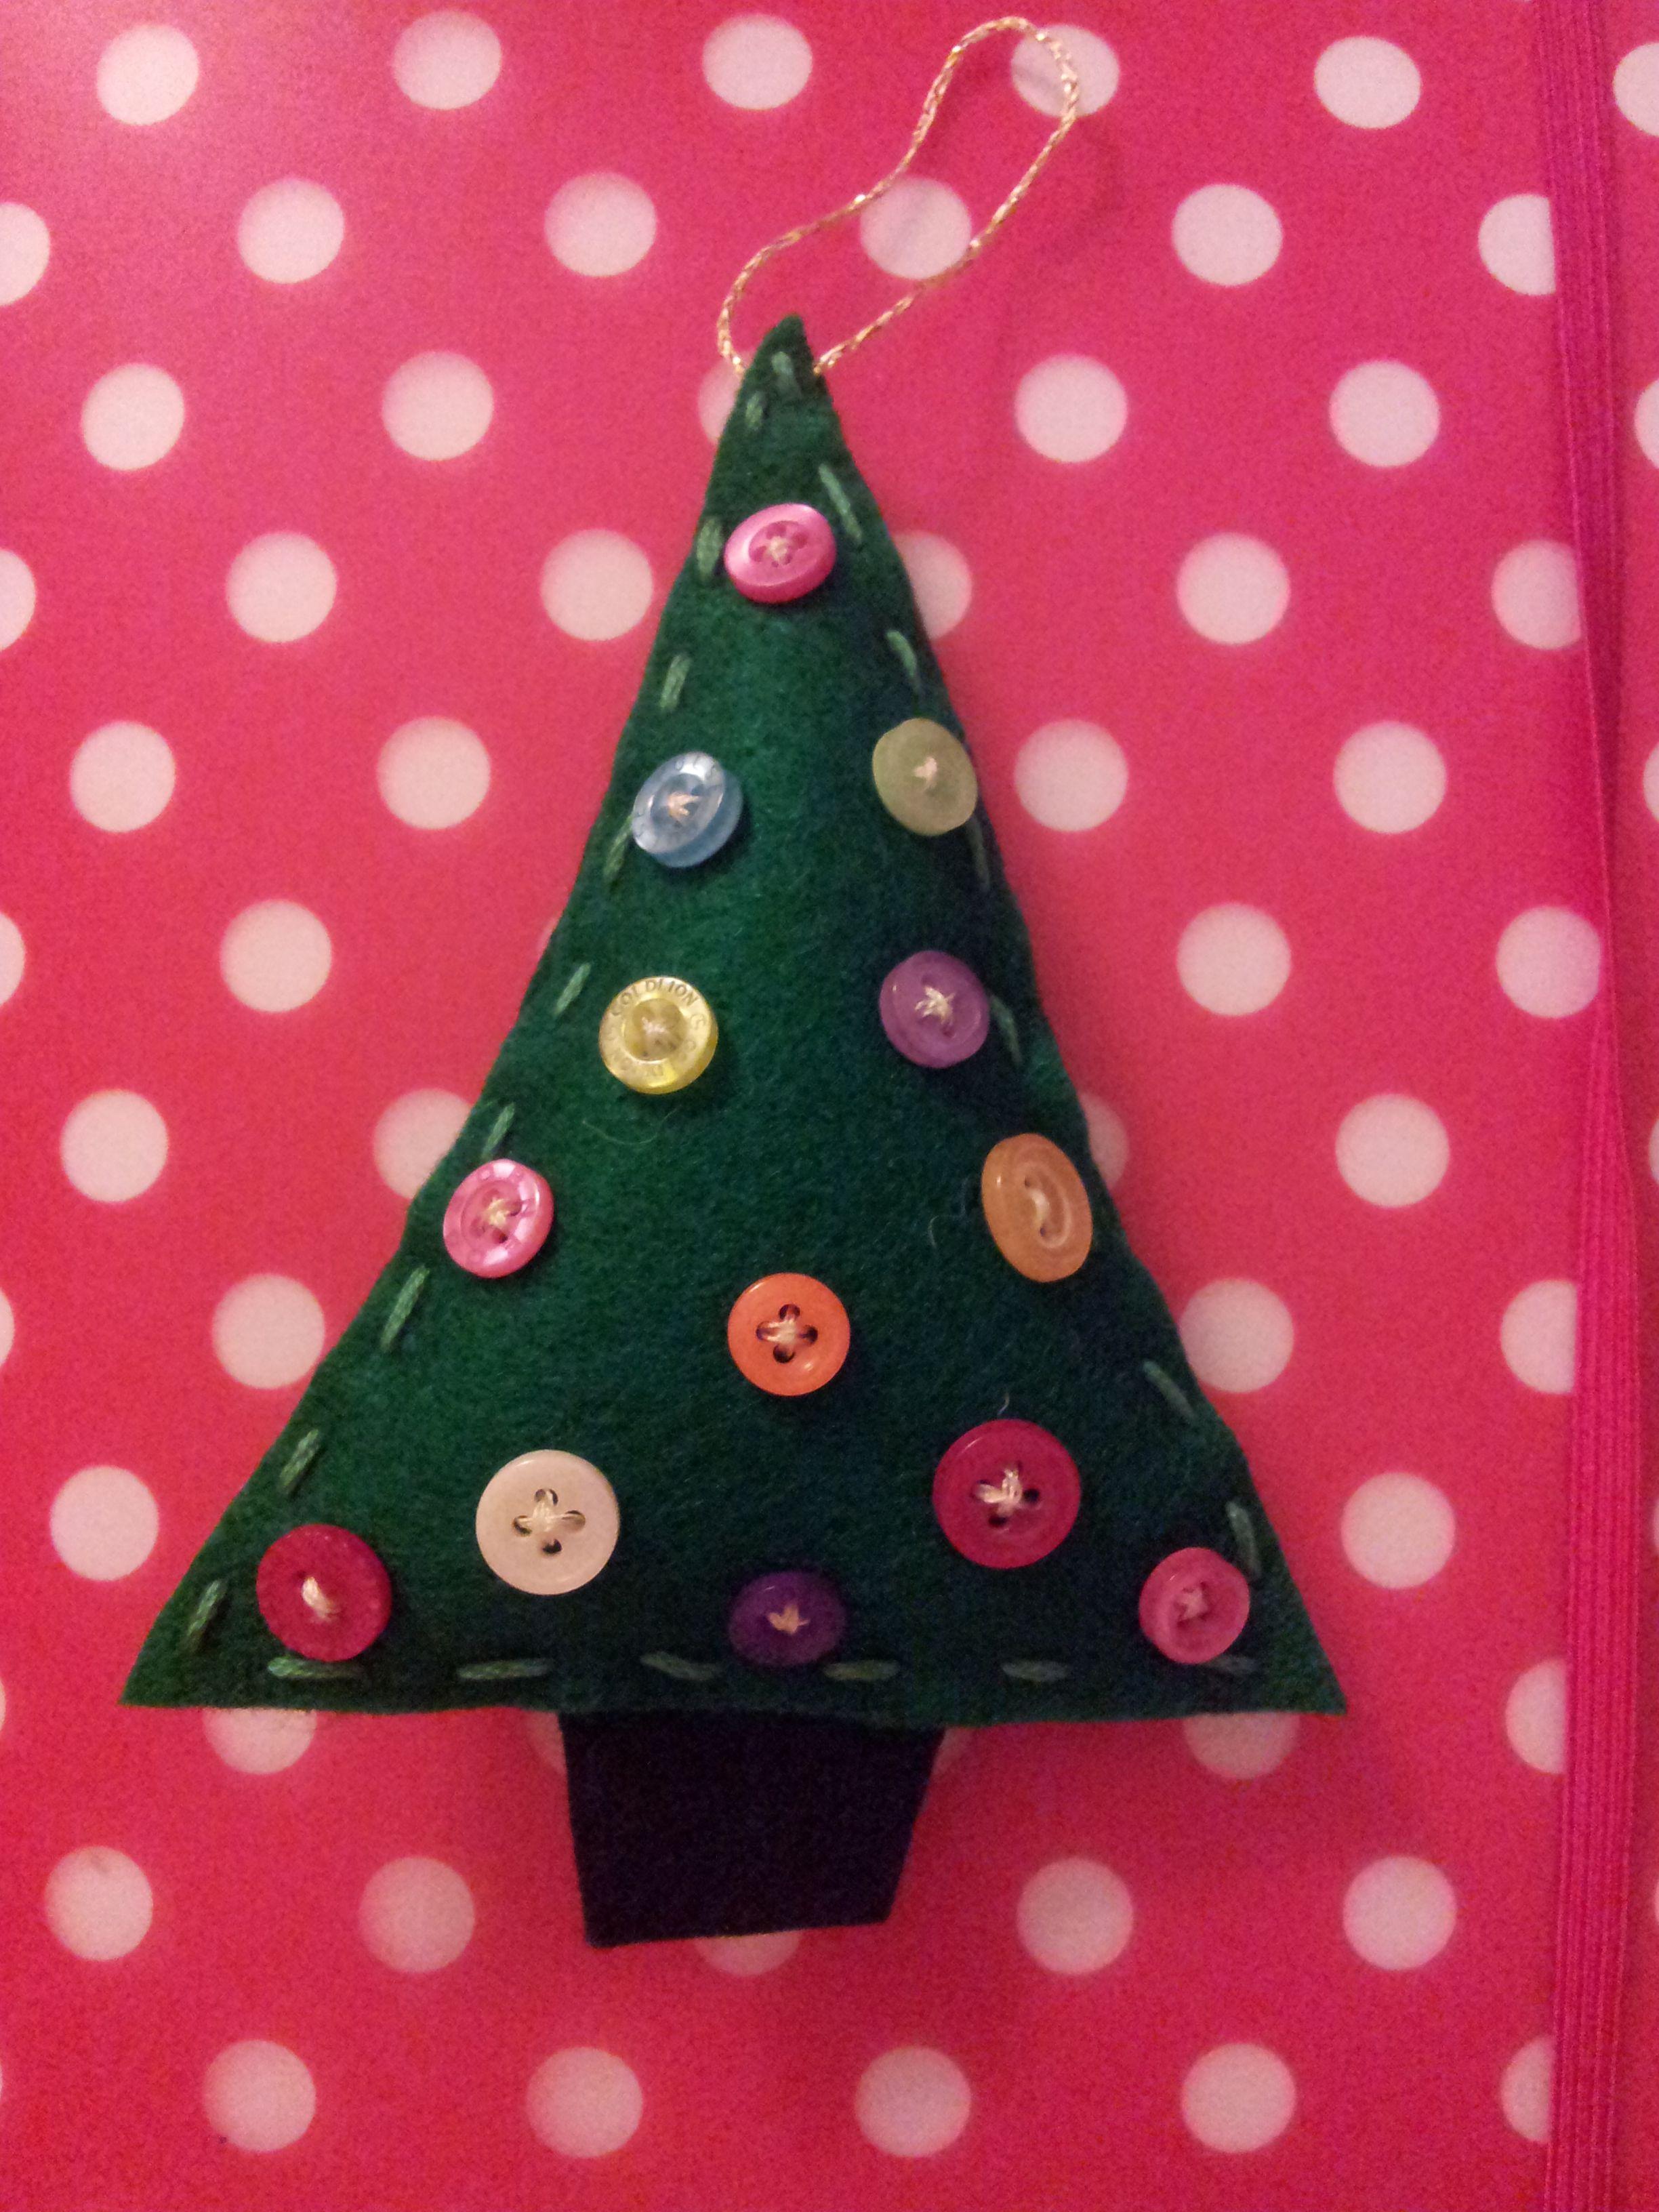 Felt And Button Christmas Tree Decoration 2013